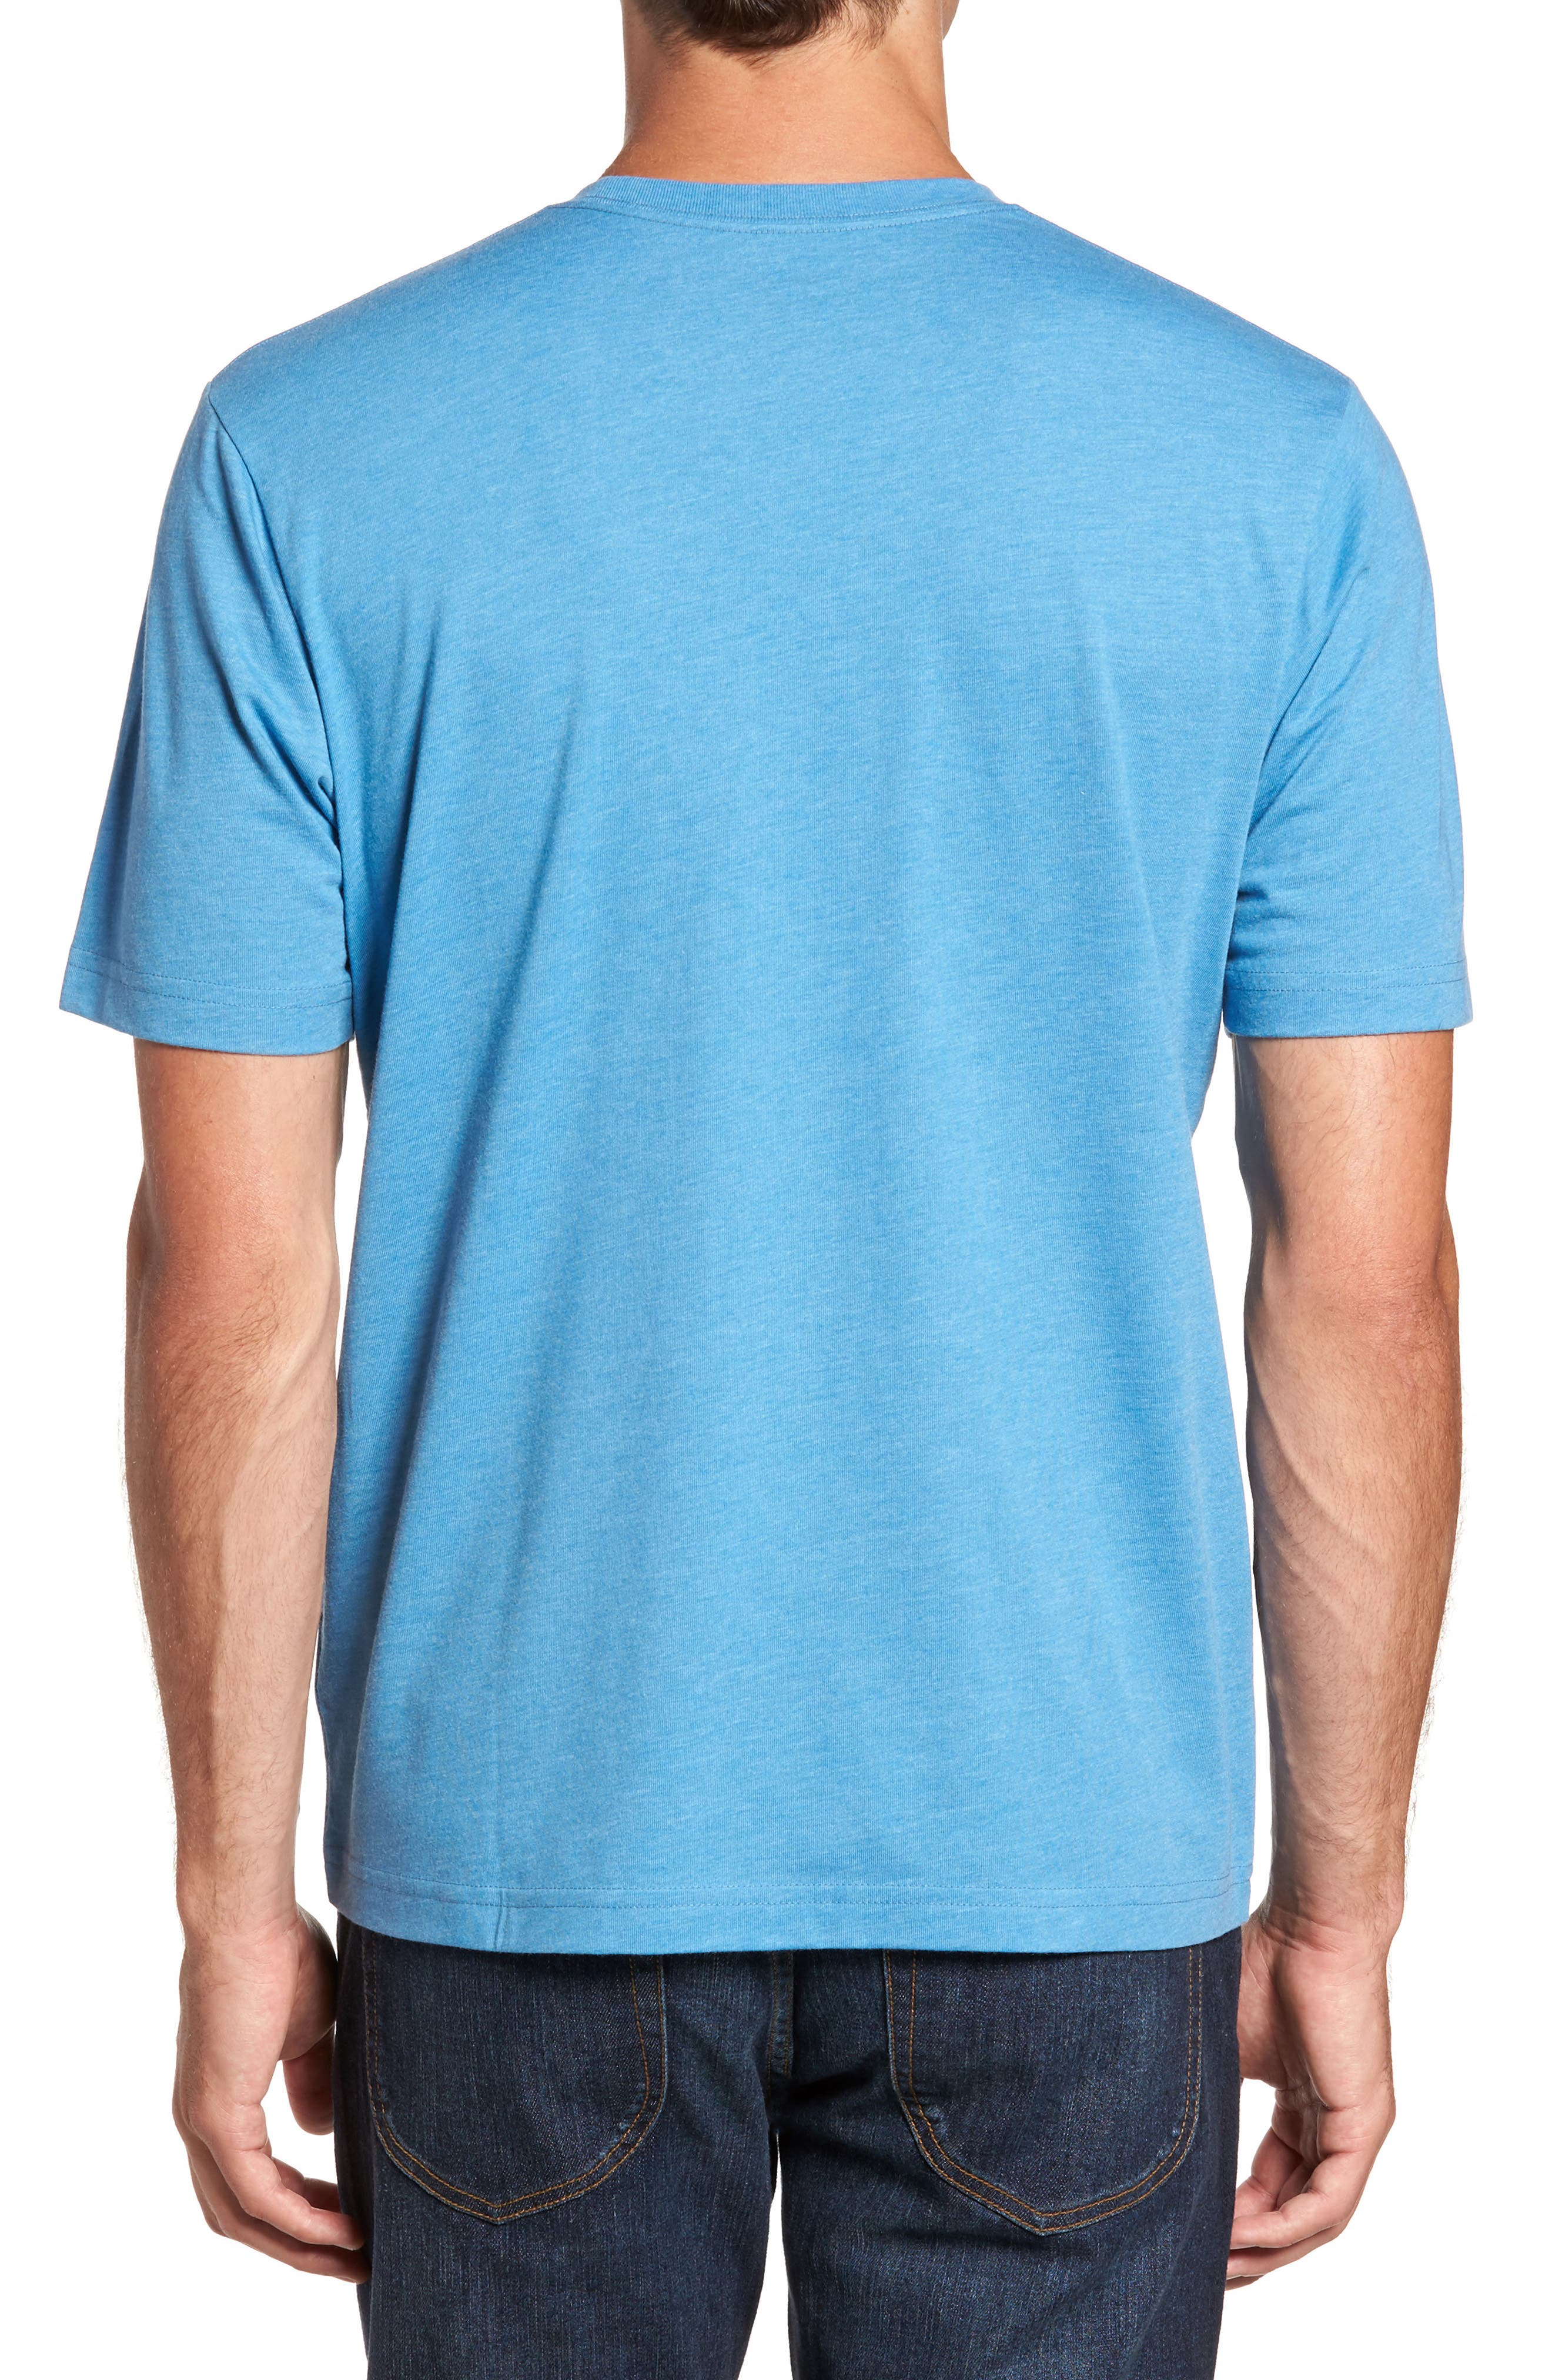 Life Champion Graphic T-Shirt,                             Alternate thumbnail 2, color,                             Heather Blue